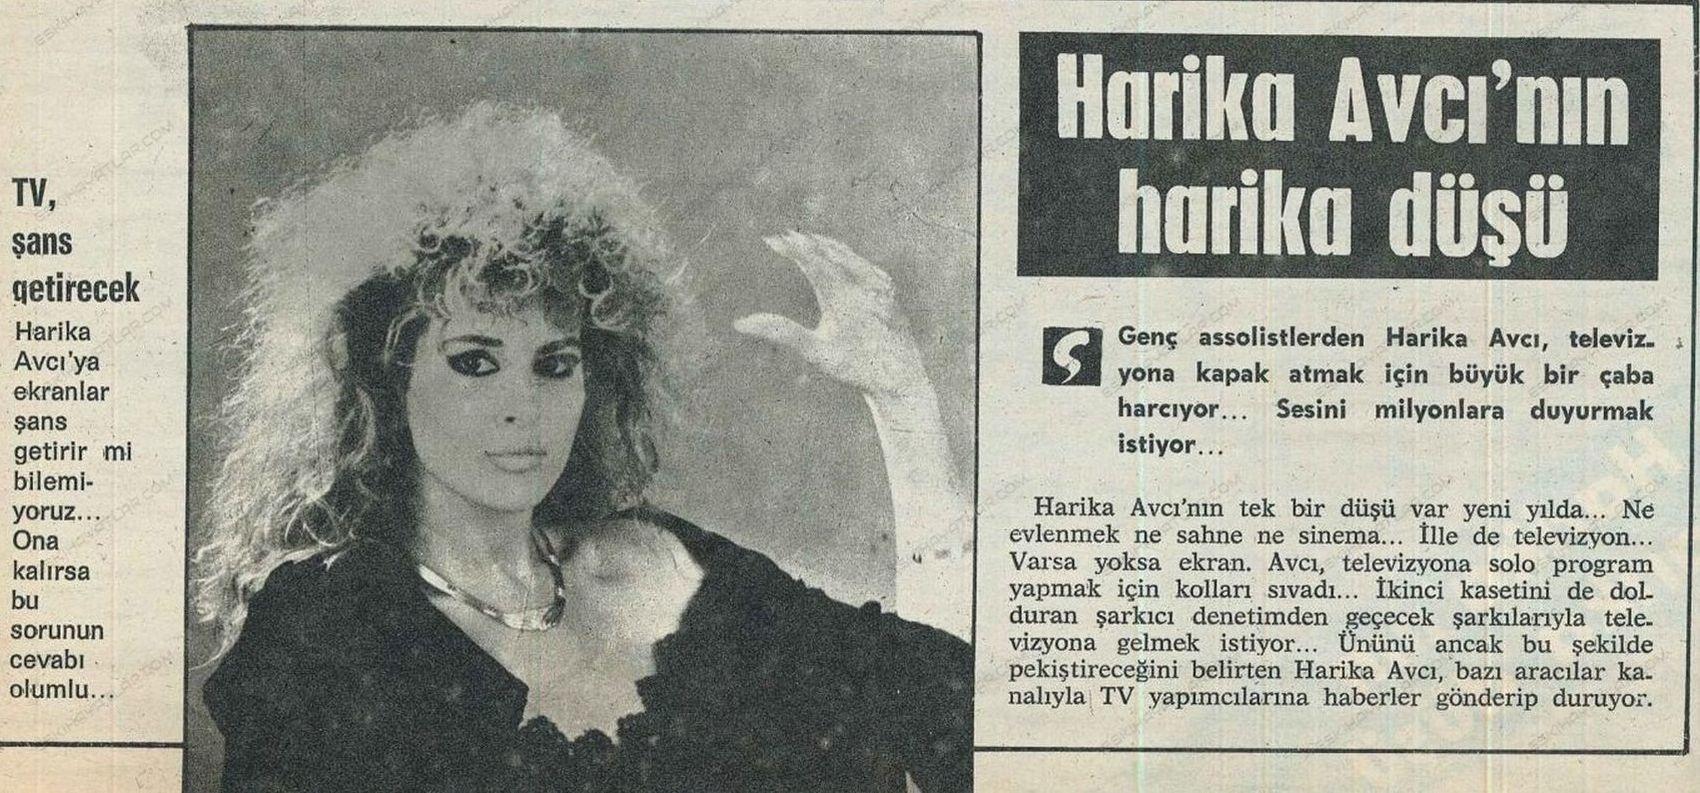 0346-harika-avci-1989-ses-dergisi